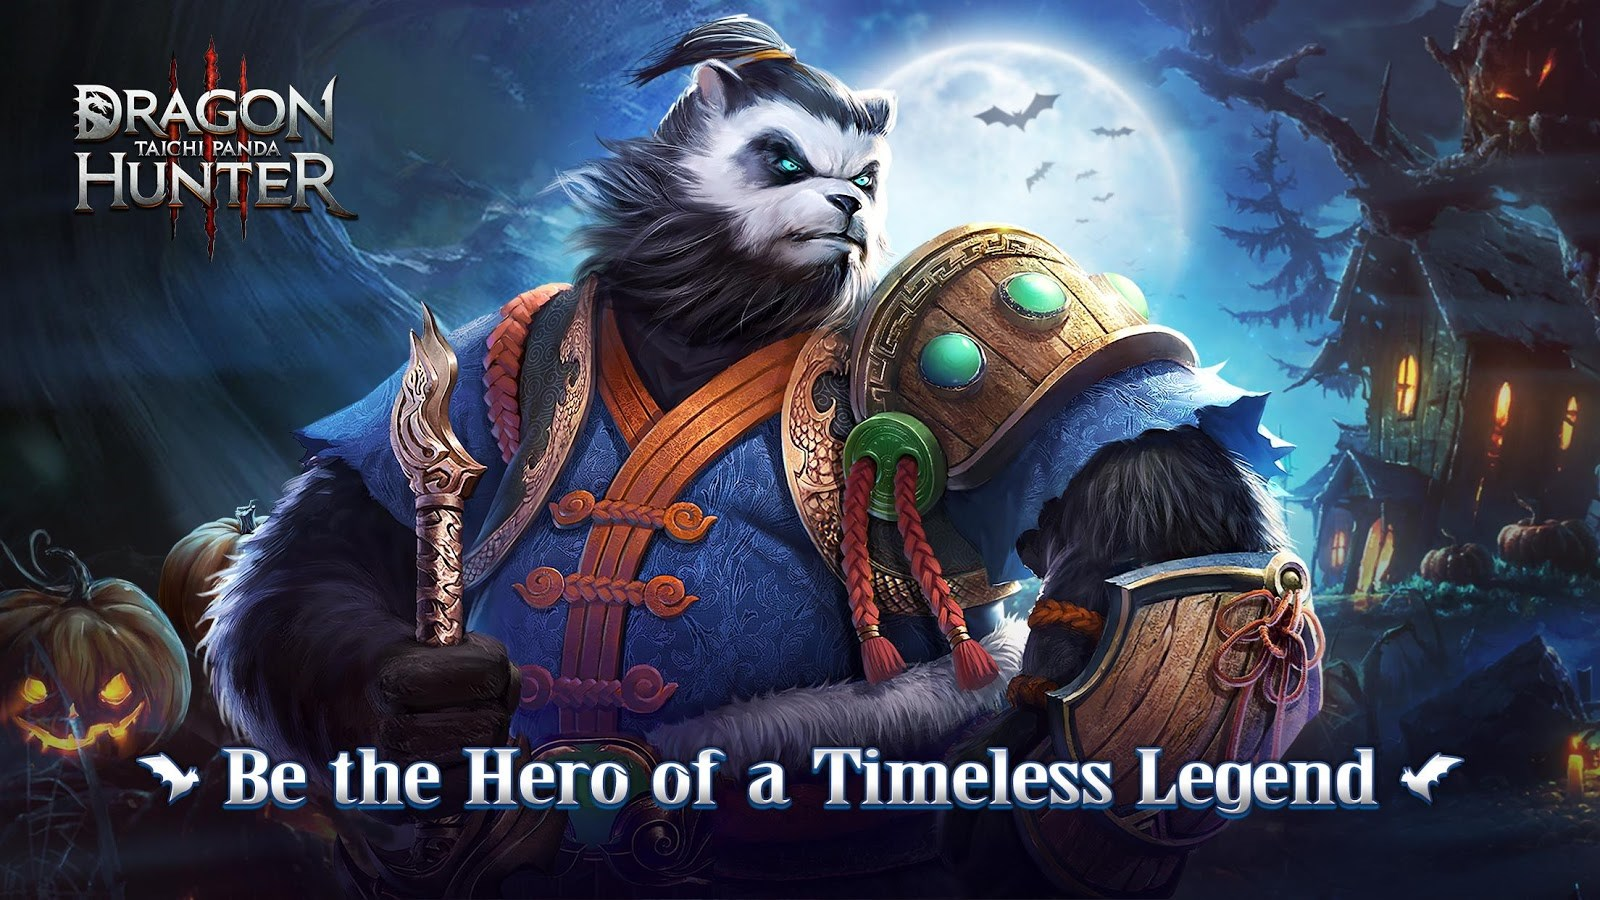 Taichi Panda 3: Dragon Hunter - Imagem 1 do software